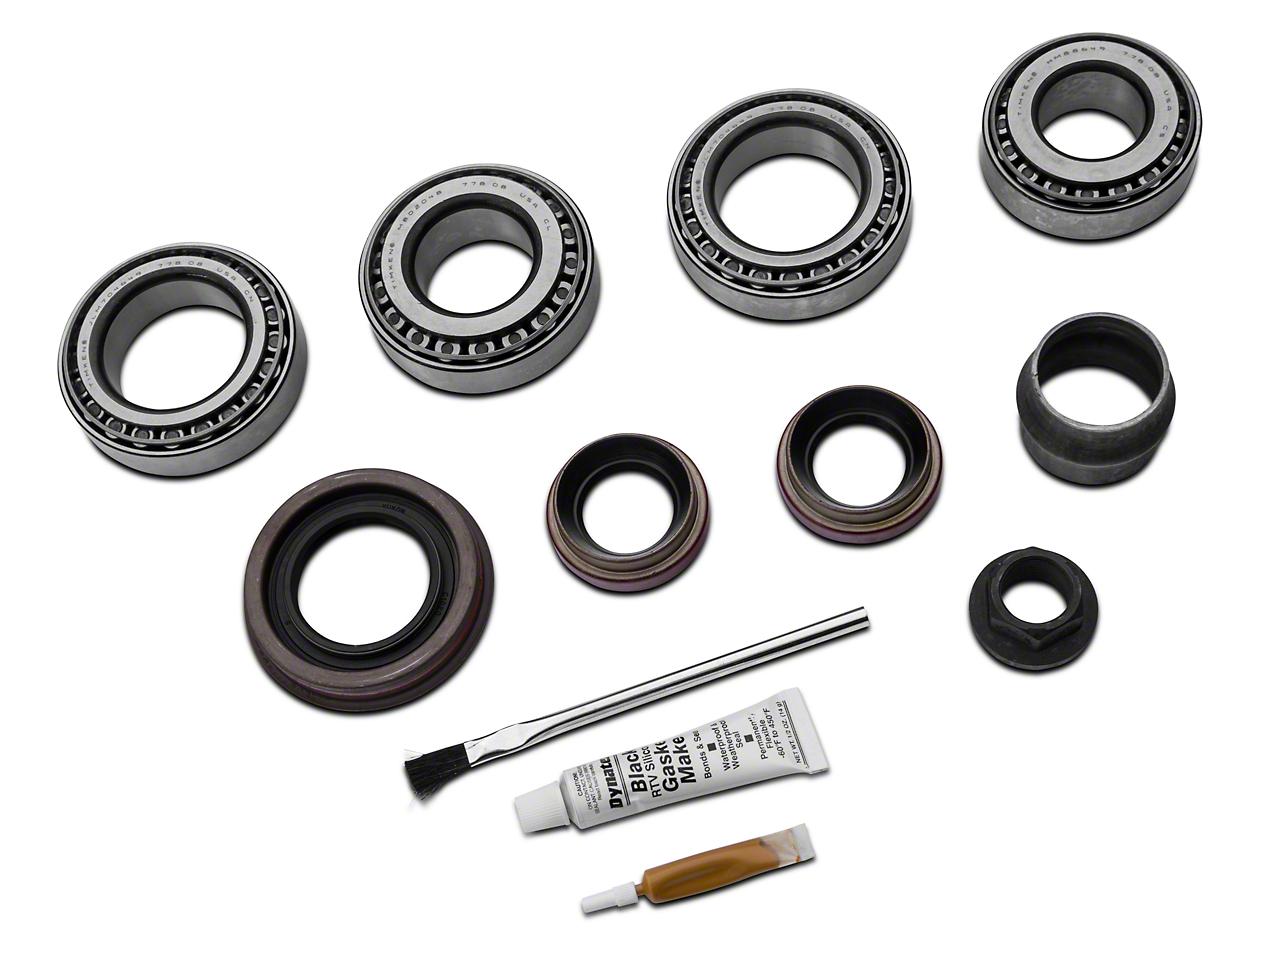 Yukon Gear Front Dana 44 Bearing Install Kit (07-17 Wrangler JK Rubicon)